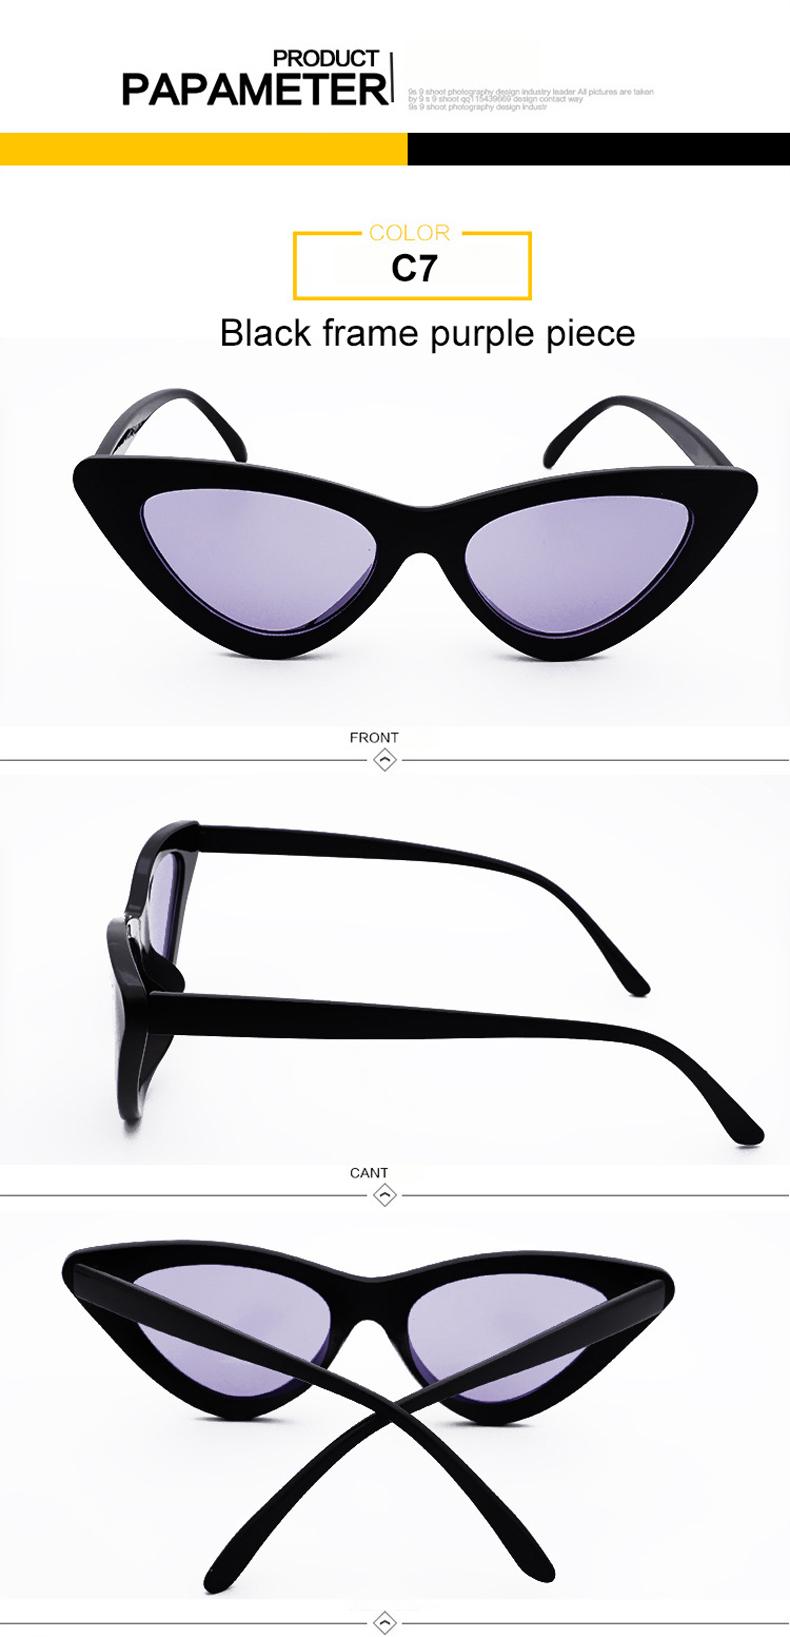 HTB13OP iLJNTKJjSspoq6A6mpXaQ - WHO CUTIE 2018 Brand Designer Black Cat Eye Sunglasses Women Cool Small Cateye Frame Sun Glasses Fashion UV400 Shades WG-008